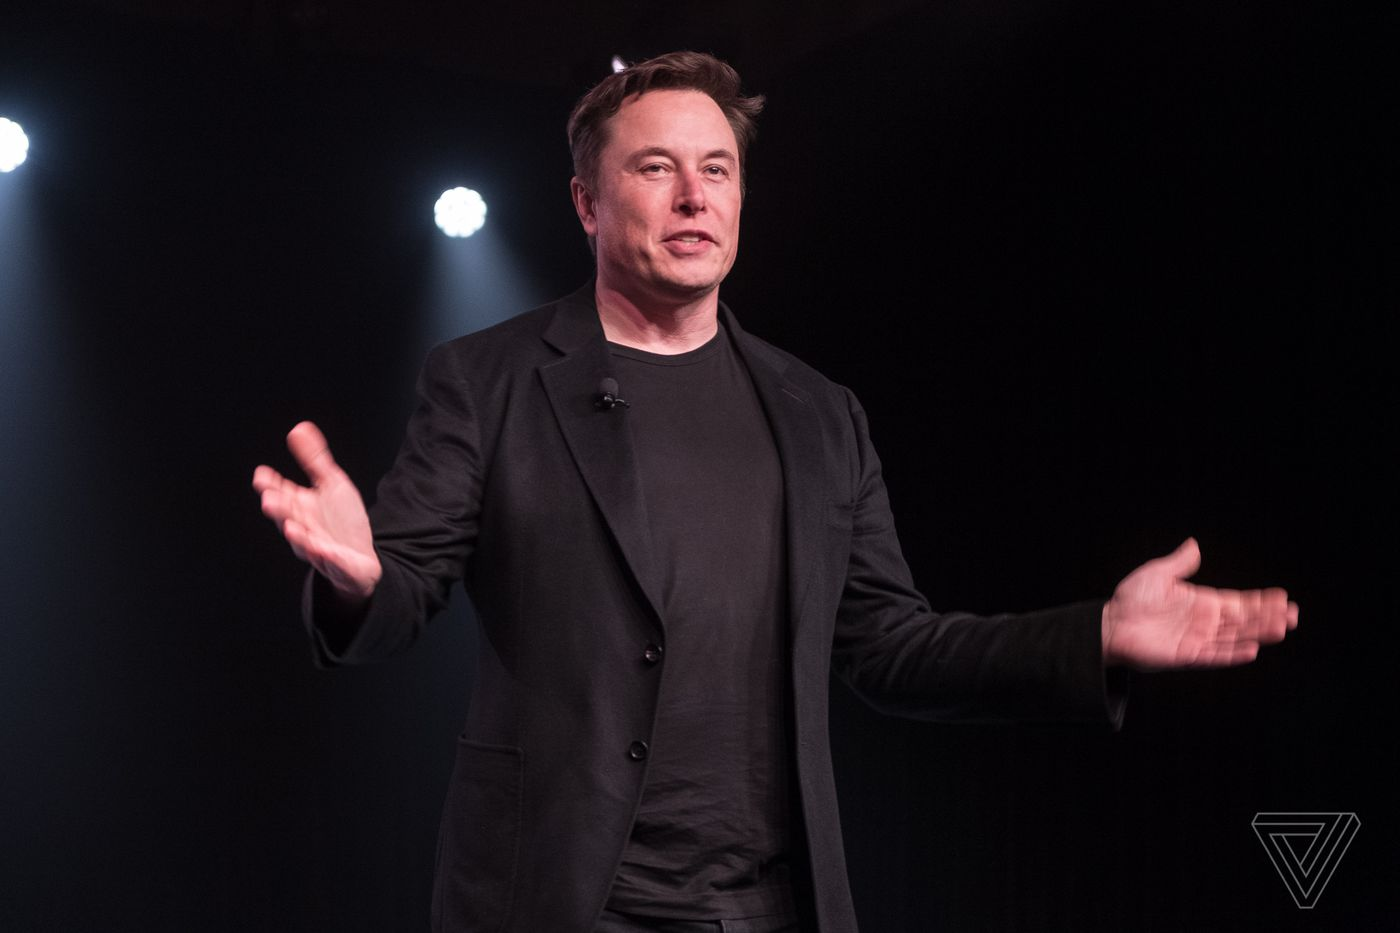 Tesla CEO Elon Musk Trial For $2.6 Billion